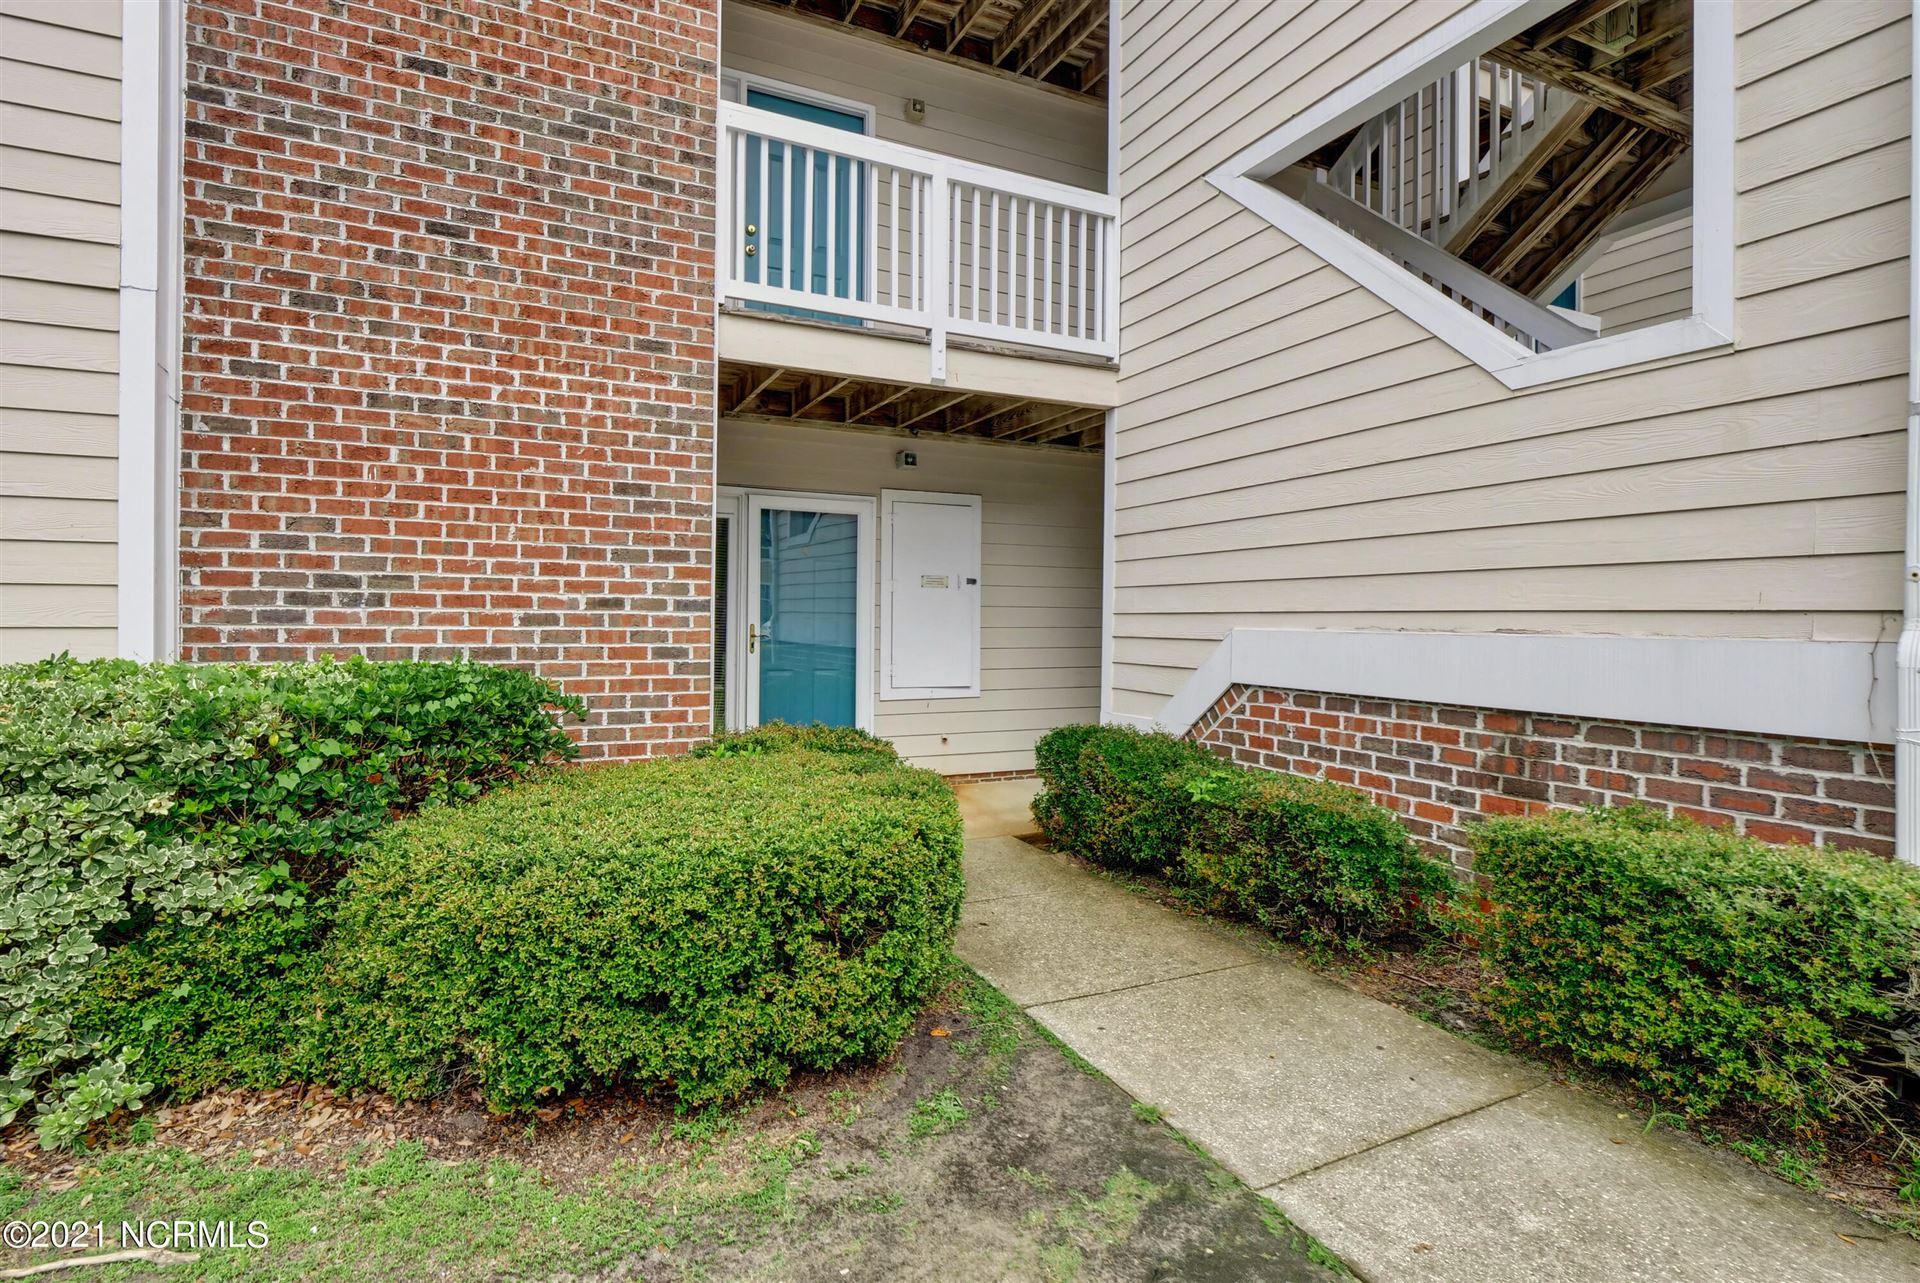 Photo for 906 Litchfield Way #C, Wilmington, NC 28405 (MLS # 100281235)